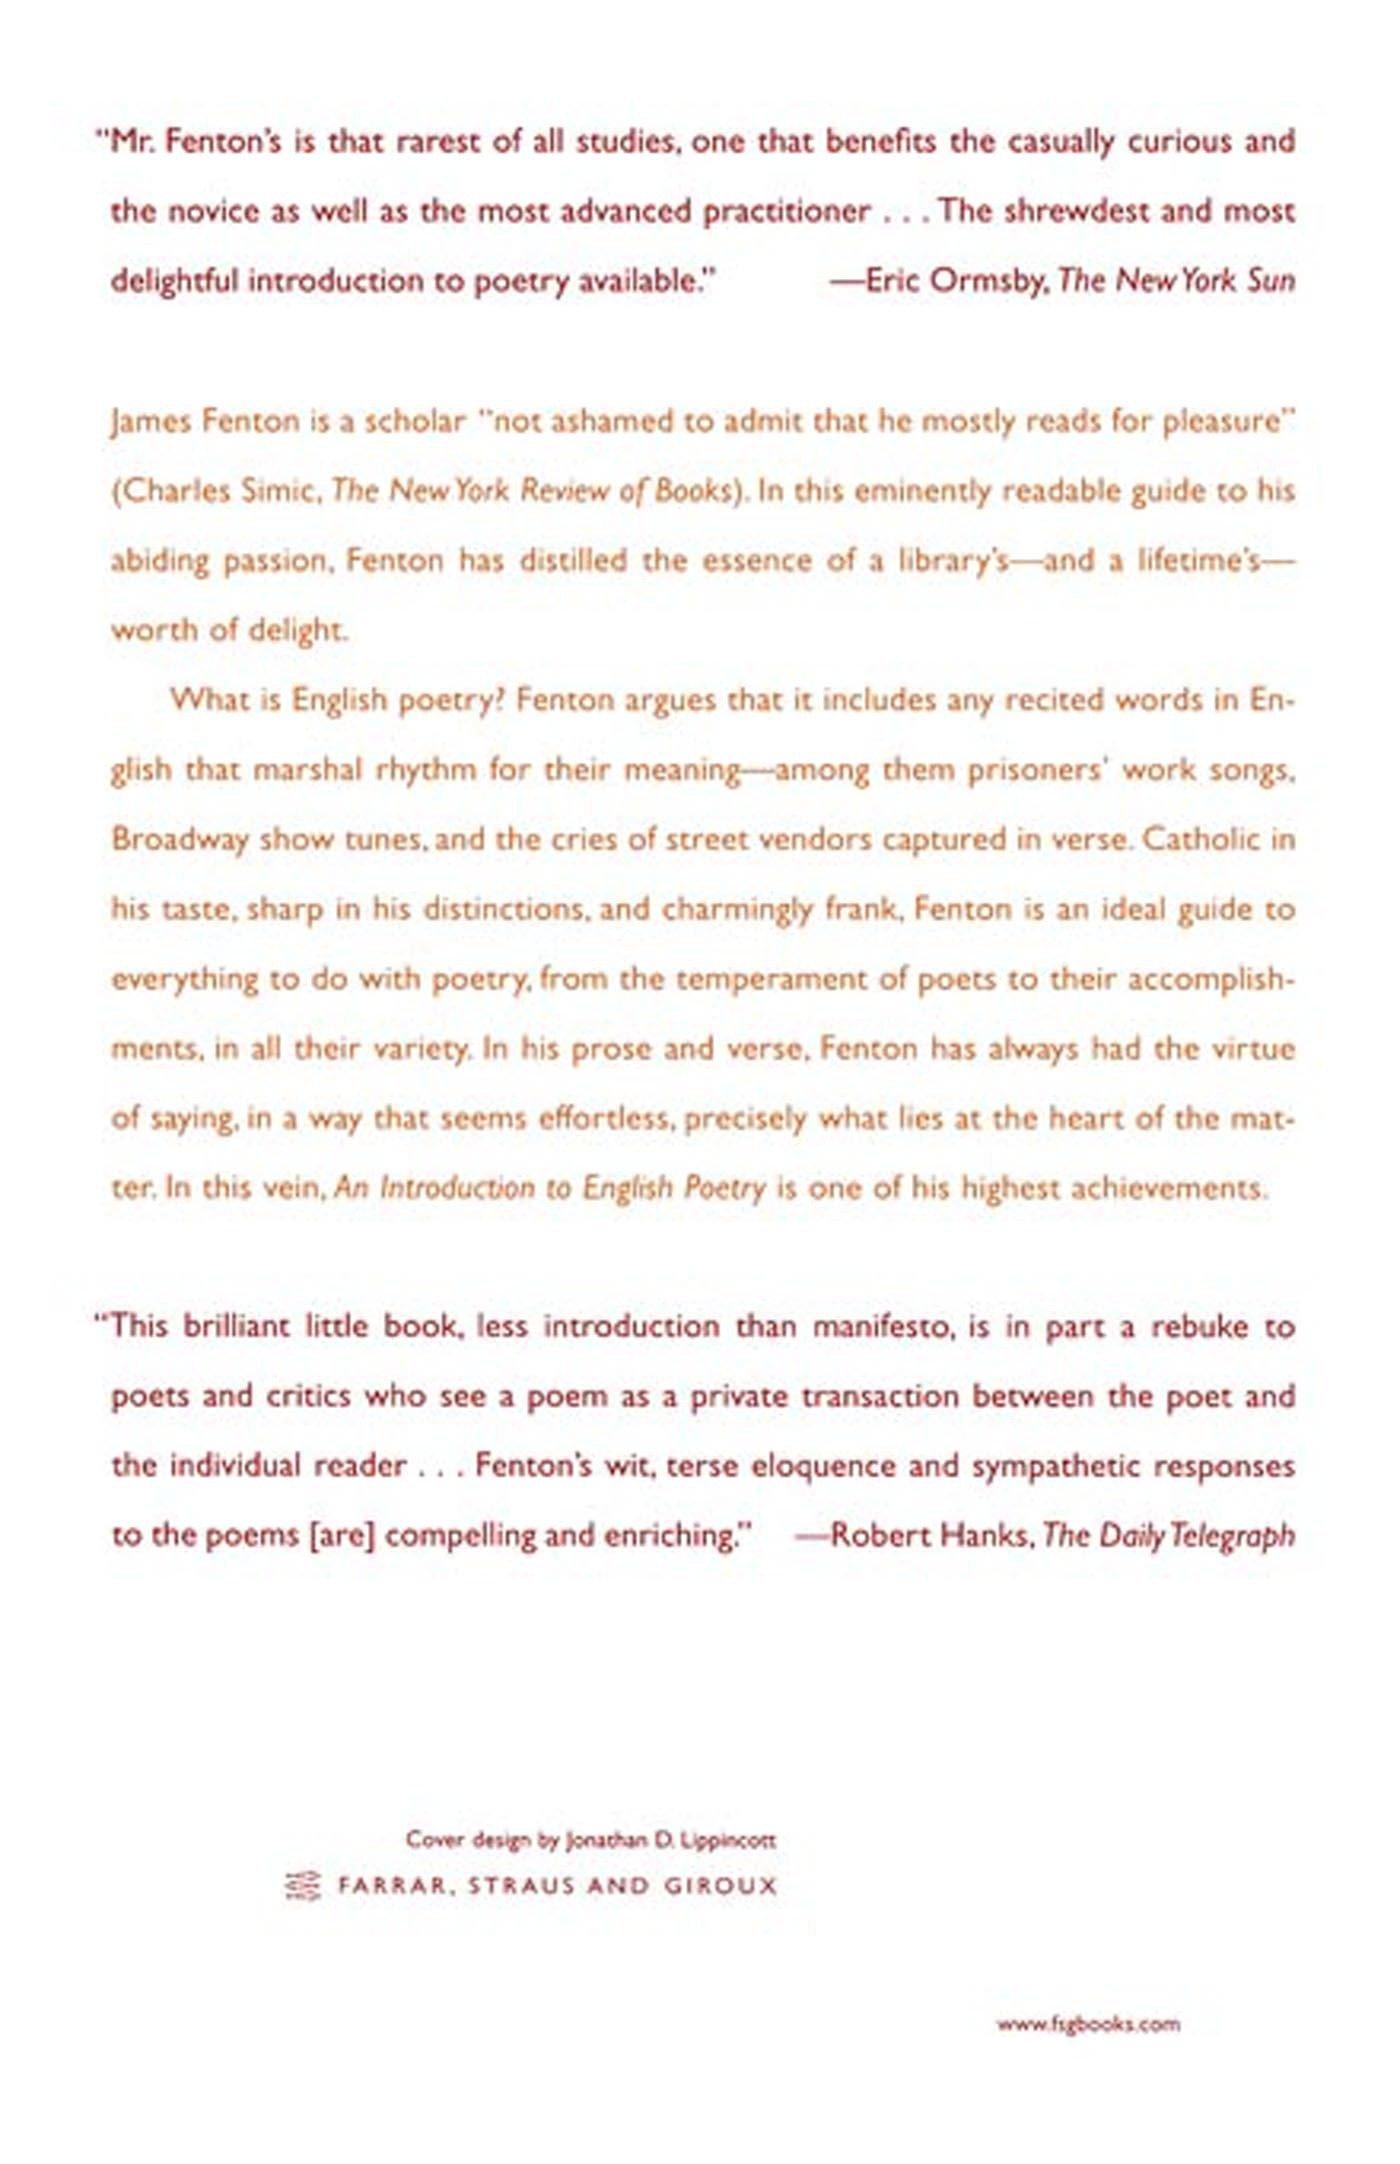 INTRODUCTION TO ENGLISH POETRY: James Fenton: 9780374528898: Amazon